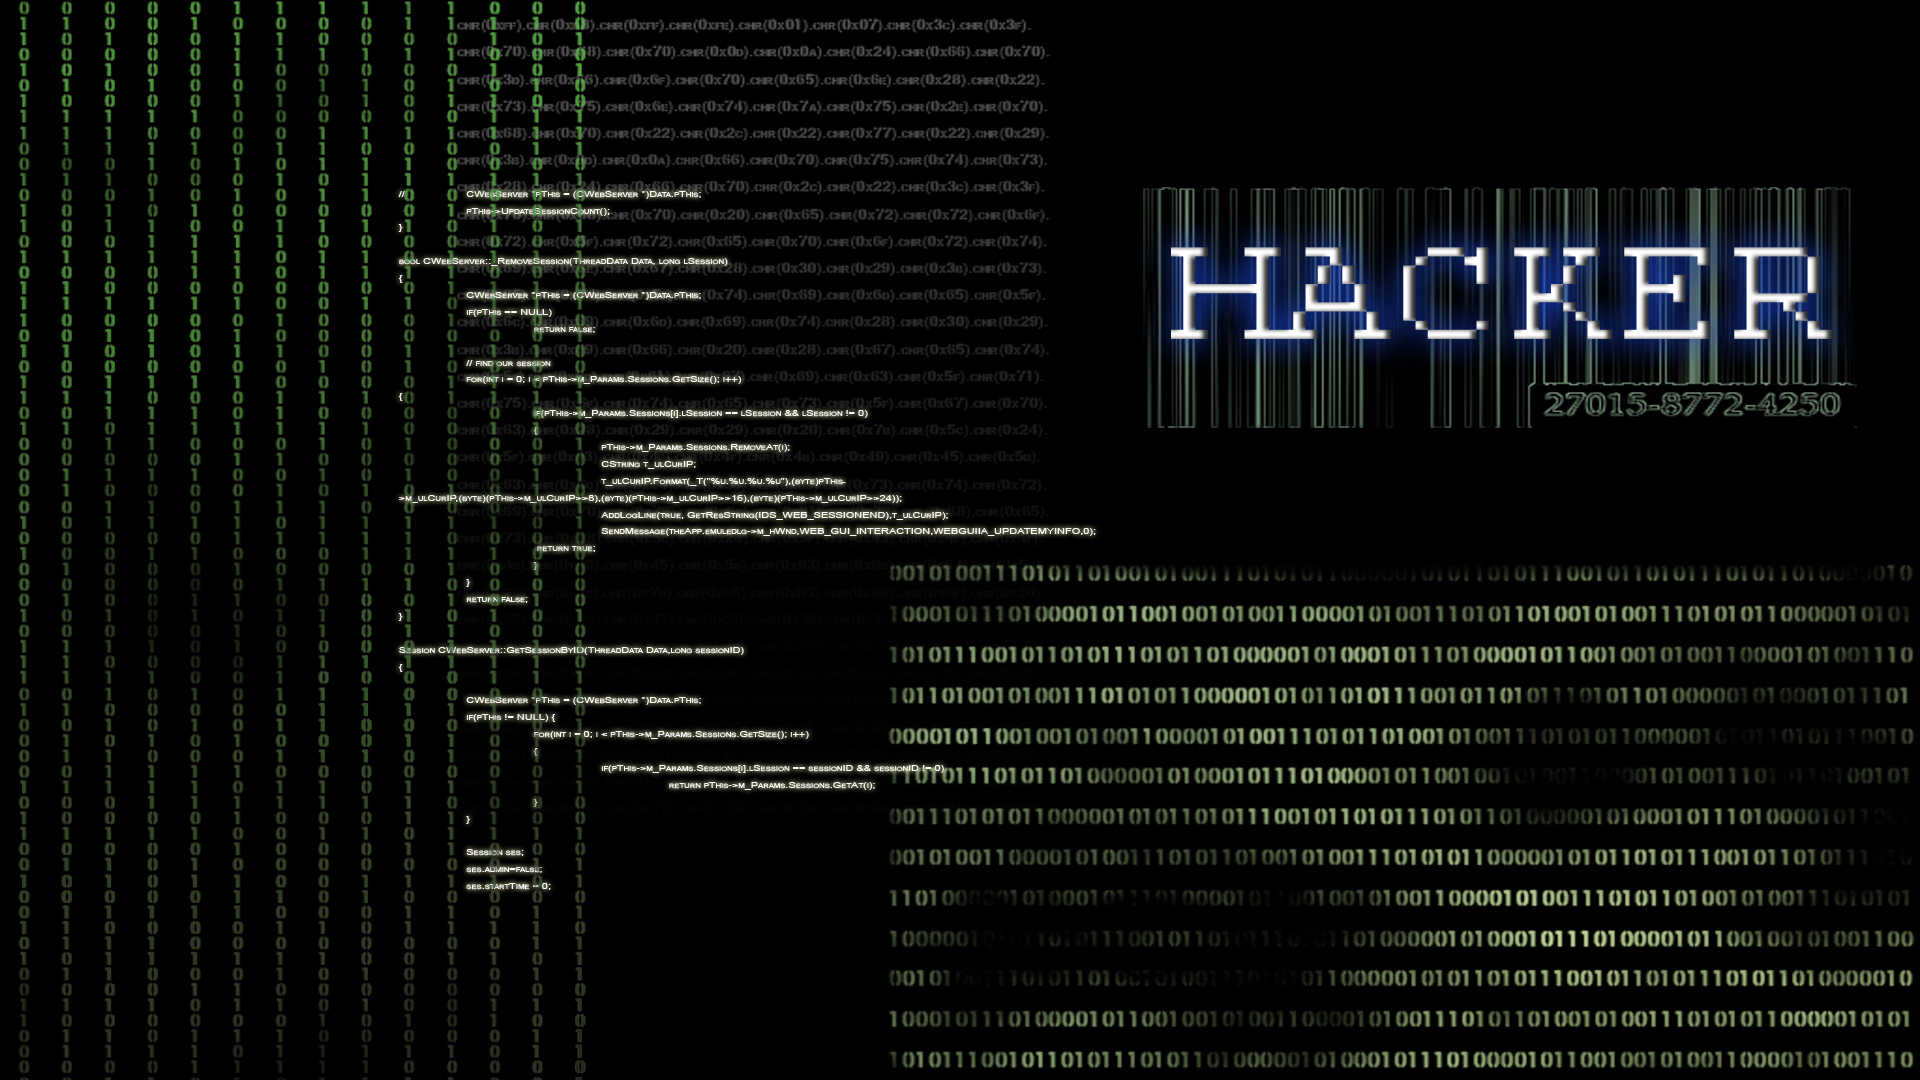 Hacker computer sadic dark anarchy 19 wallpaper 1920x1080 219144 1920x1080